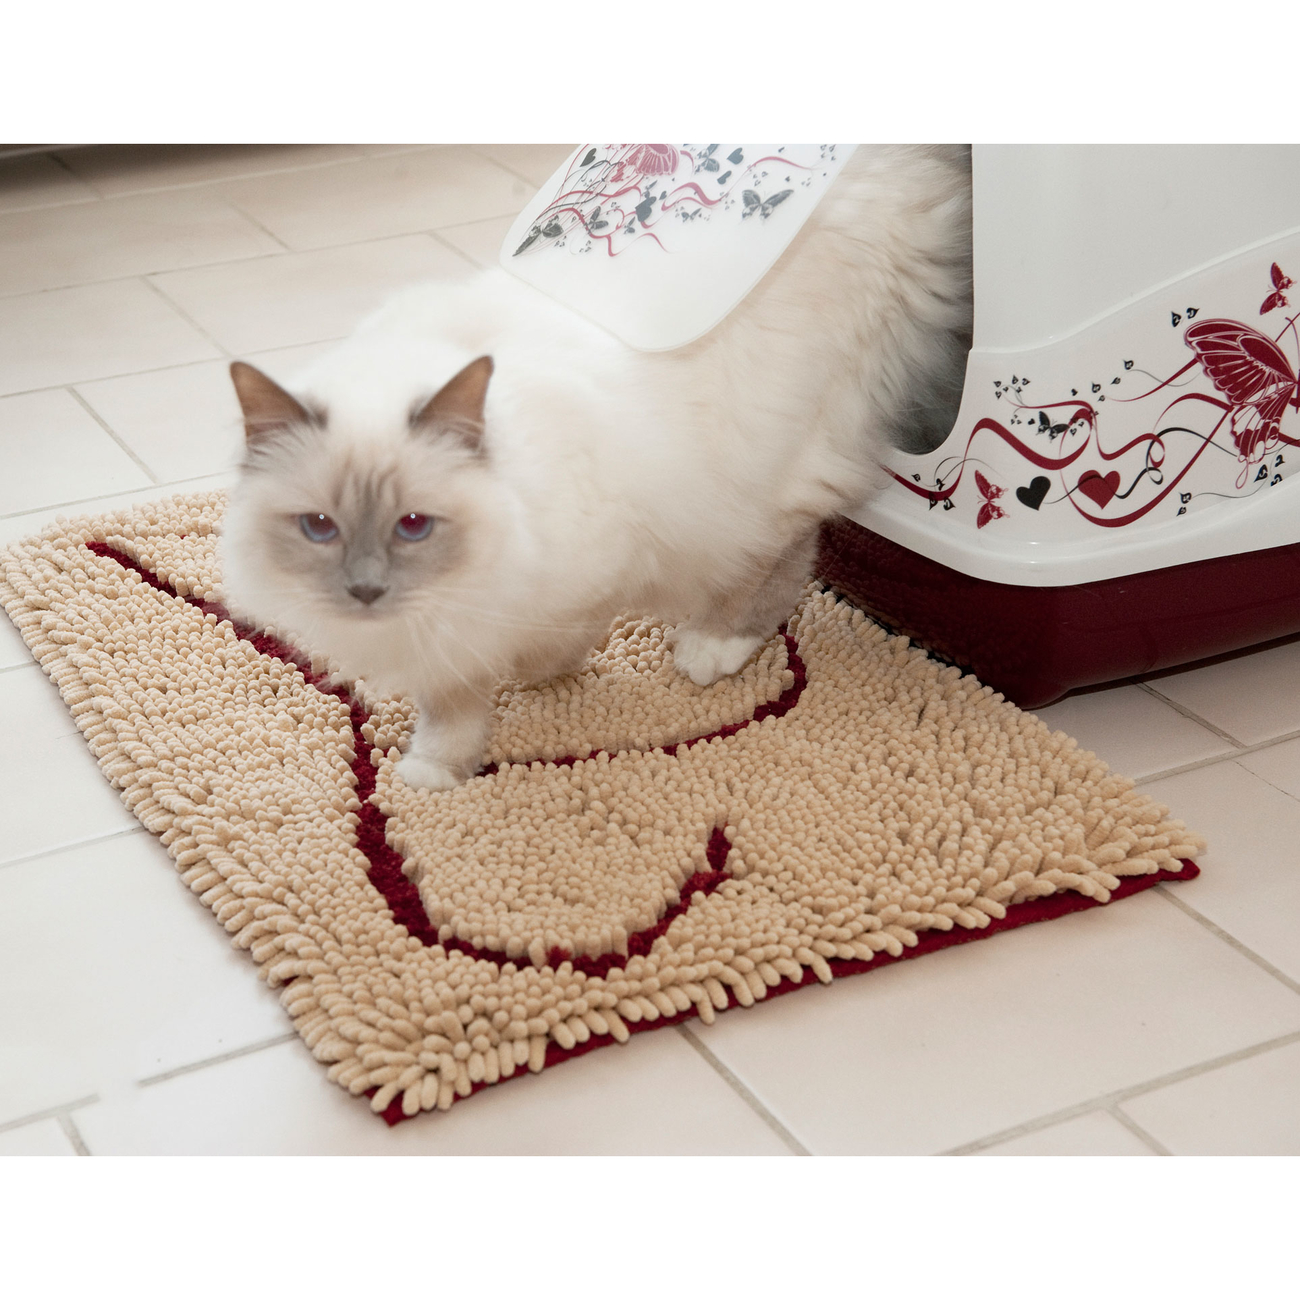 Dog Gone Smart Cat Litter Mat Katzenmatte, Bild 6